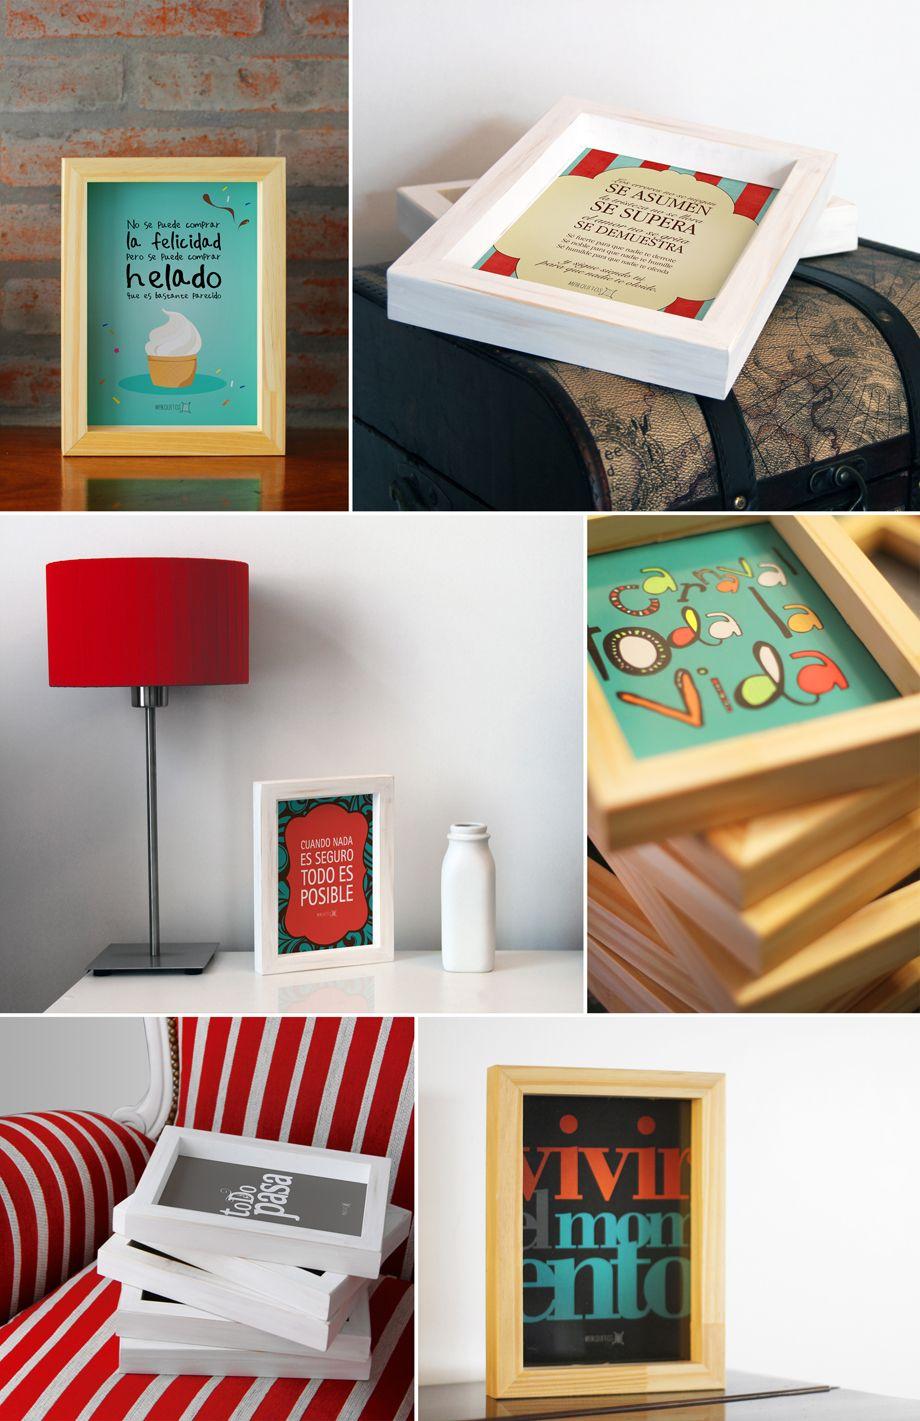 fotos — MARQUITOS [enmarcamos ideas creativas] | Un lugar que ...